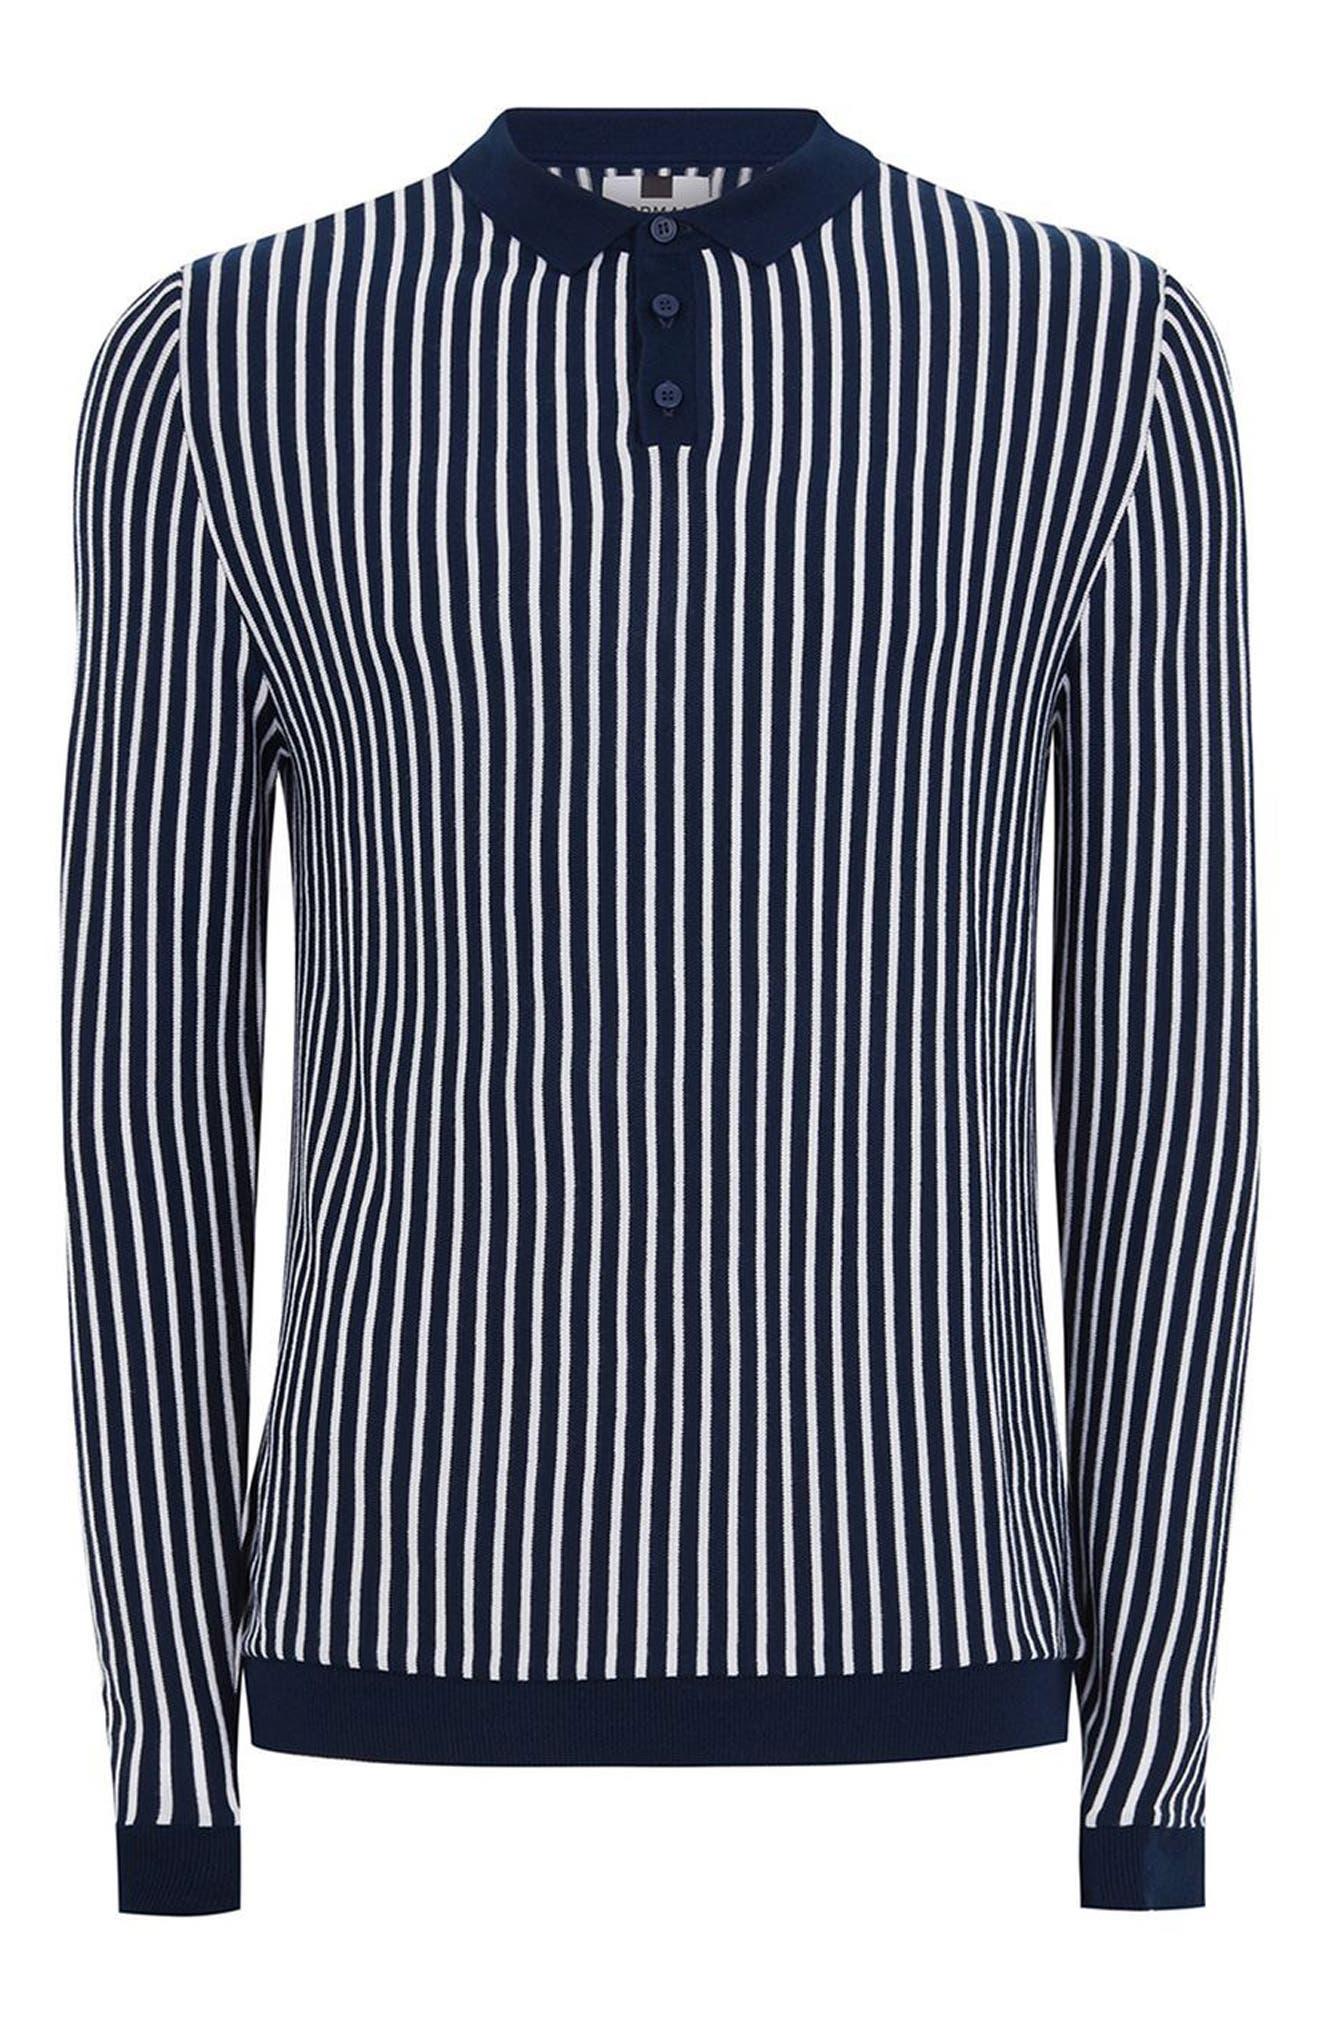 Stripe Knit Polo Sweater,                             Alternate thumbnail 4, color,                             410